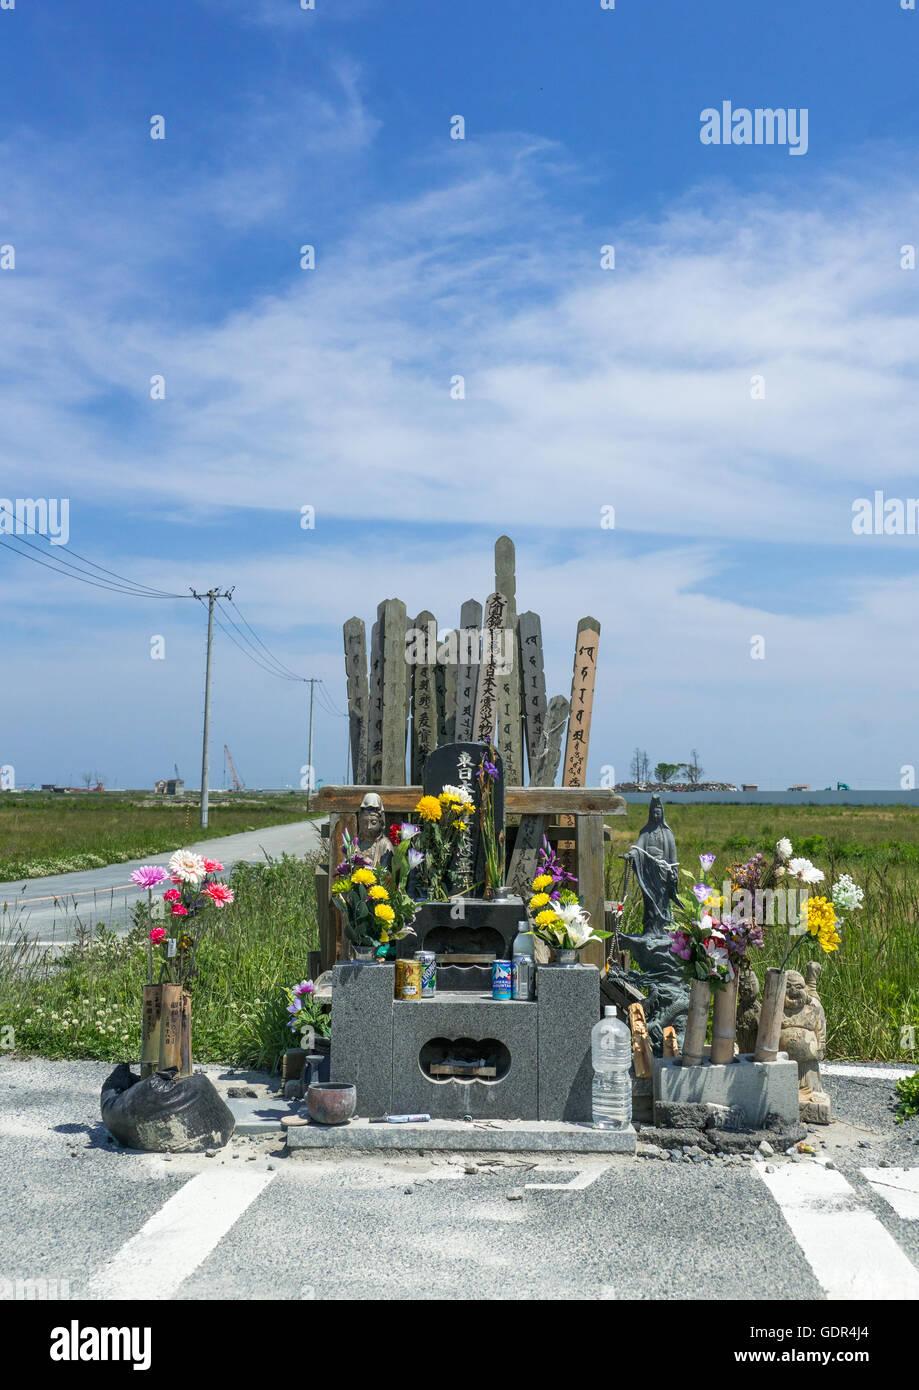 A shrine to victims of the 2011 tsunami, Fukushima prefecture, Namie, Japan - Stock Image